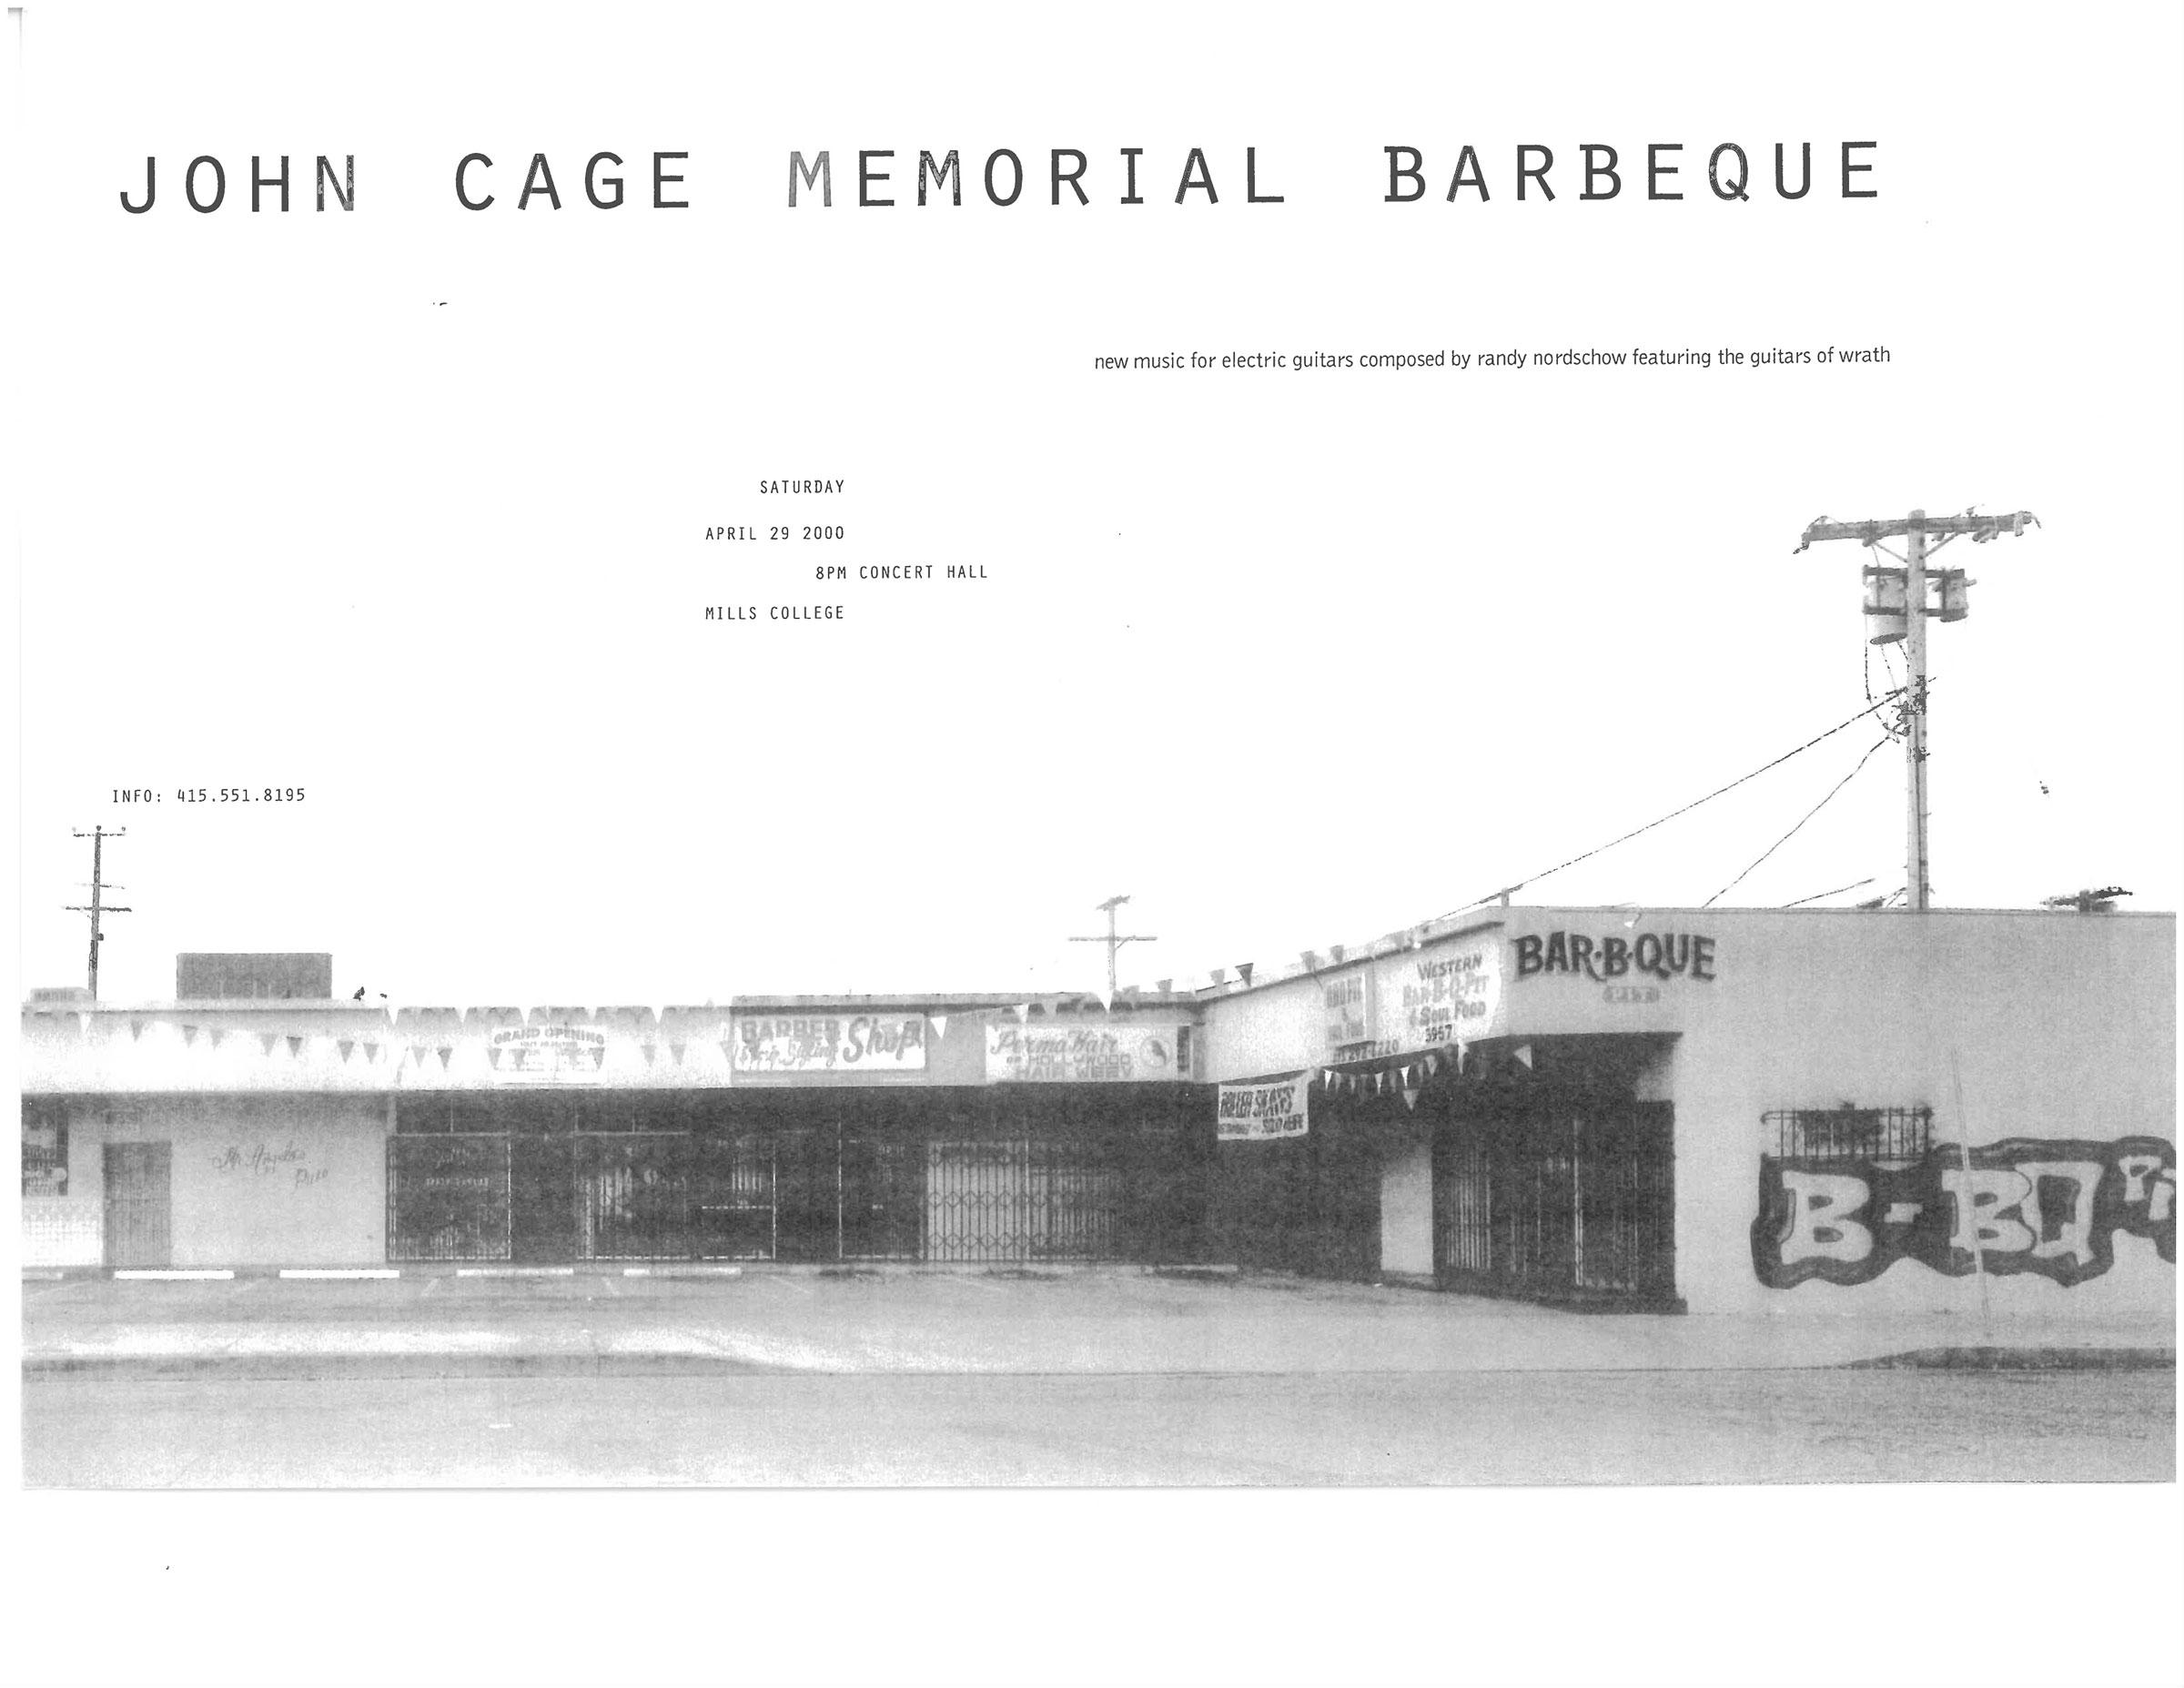 John Cage Memorial Barbecue